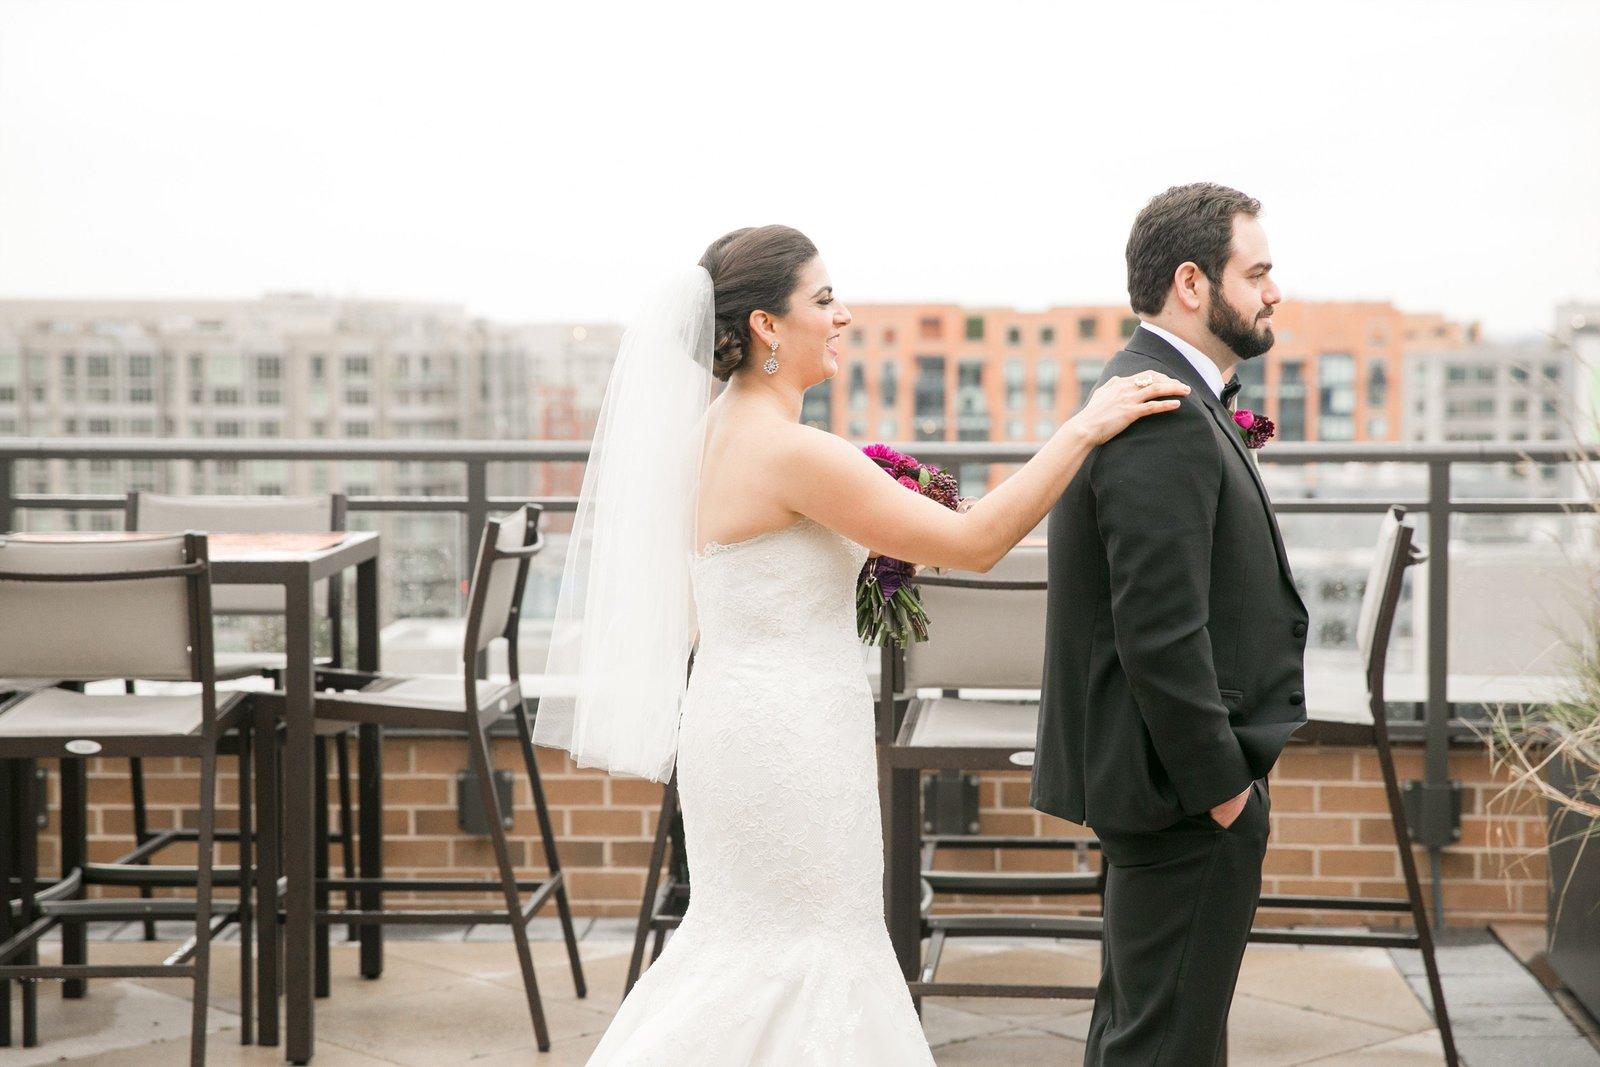 Black-tie-wedding-photos-longview-gallery-dc (132)